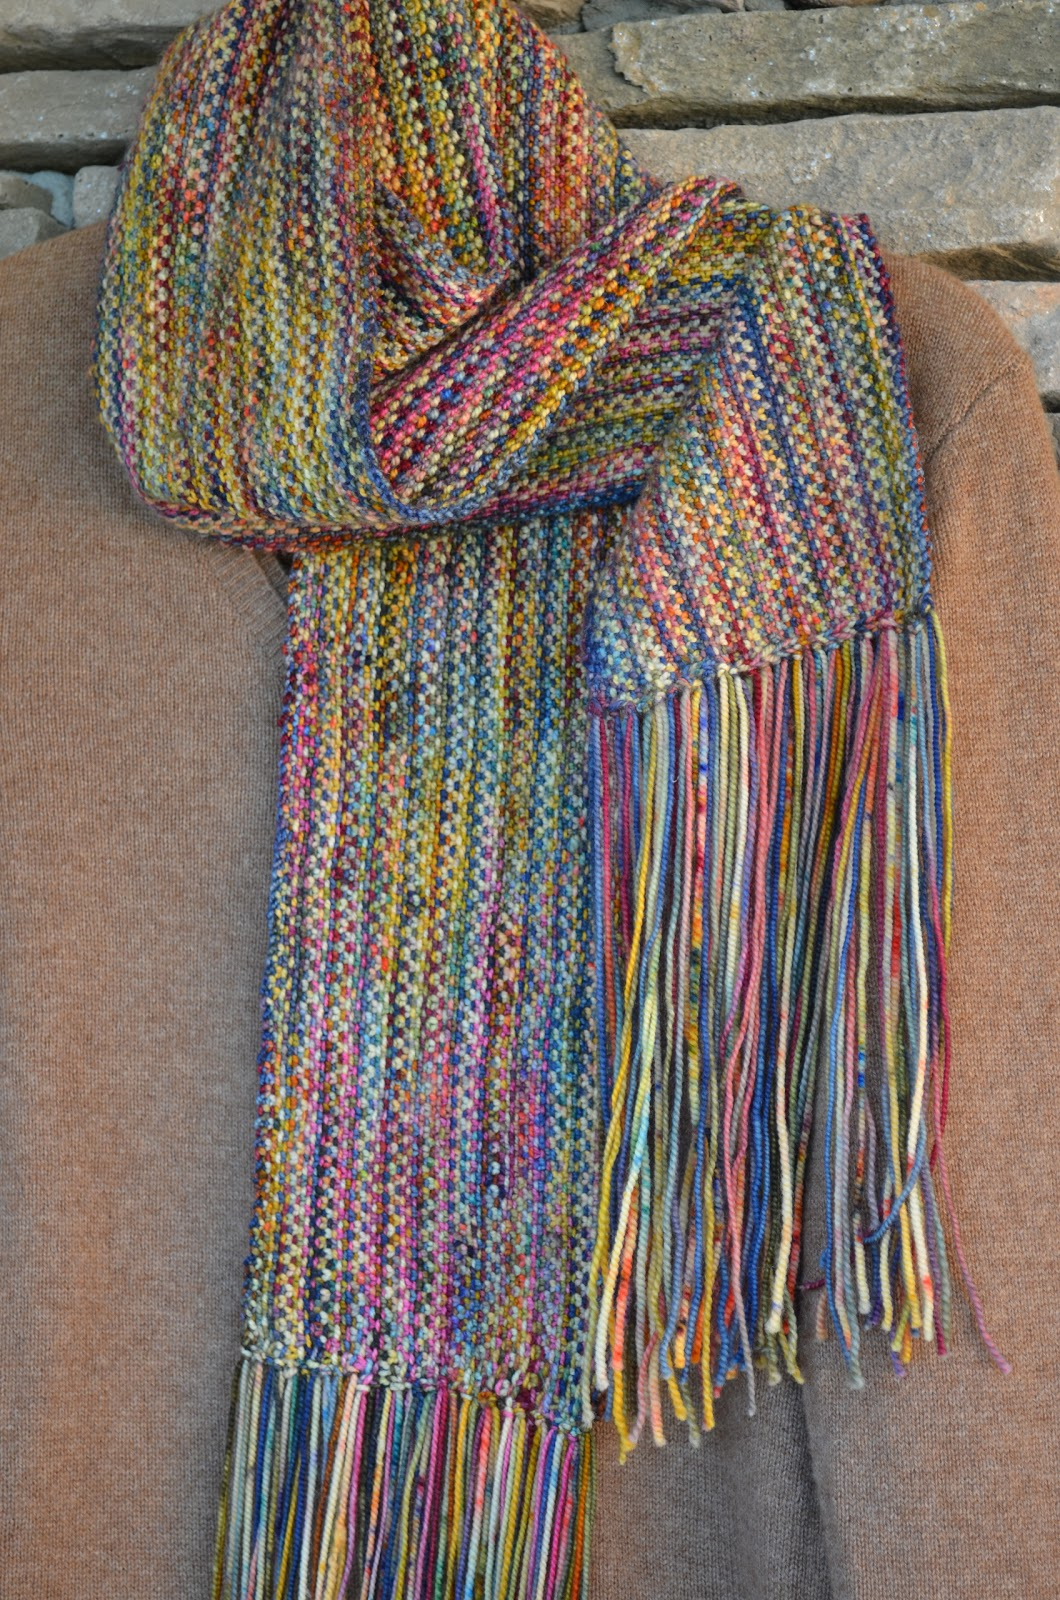 Knitting on Cloud IX: a year end scarf